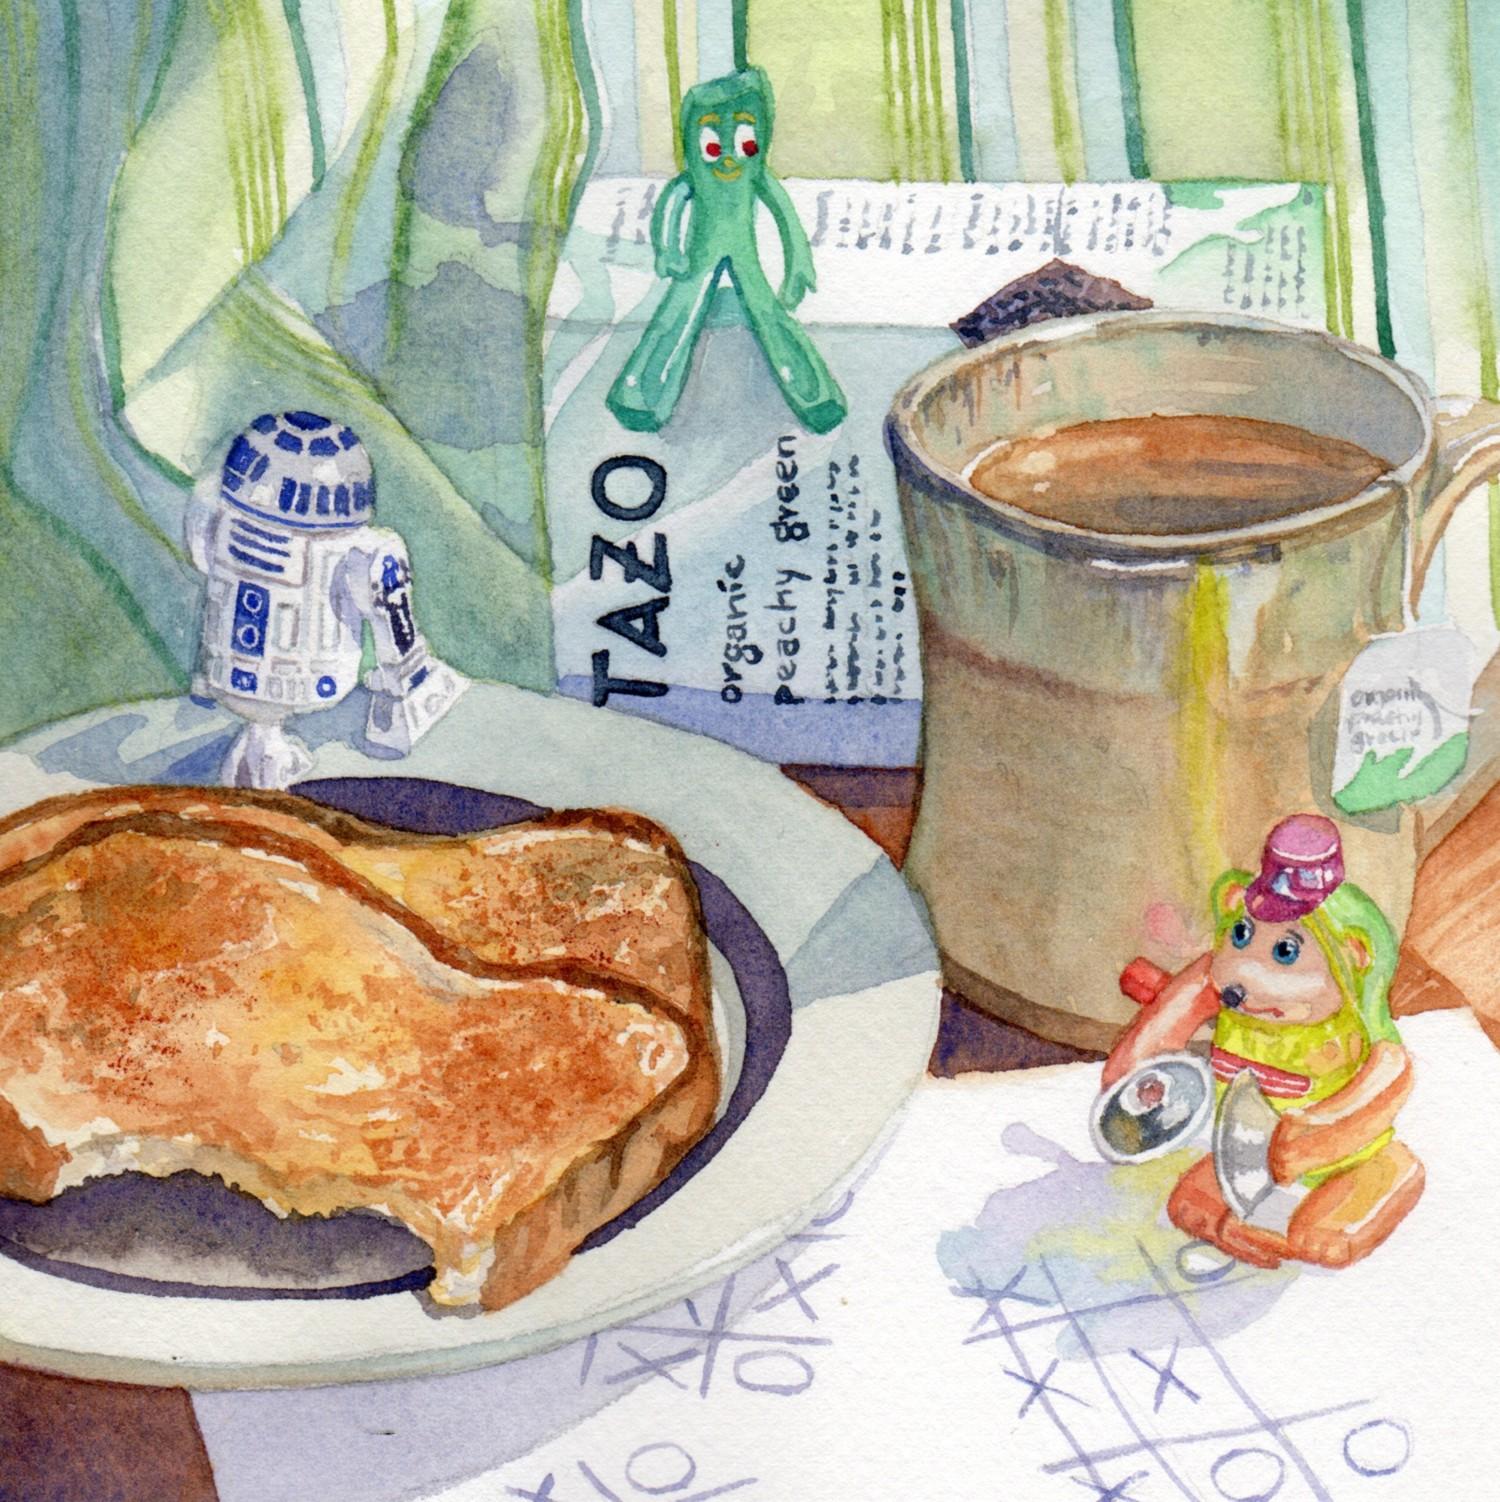 Day 29 Toys, Tazo Tea, Toast, Tic-Tac-Toe © Lorraine Watry